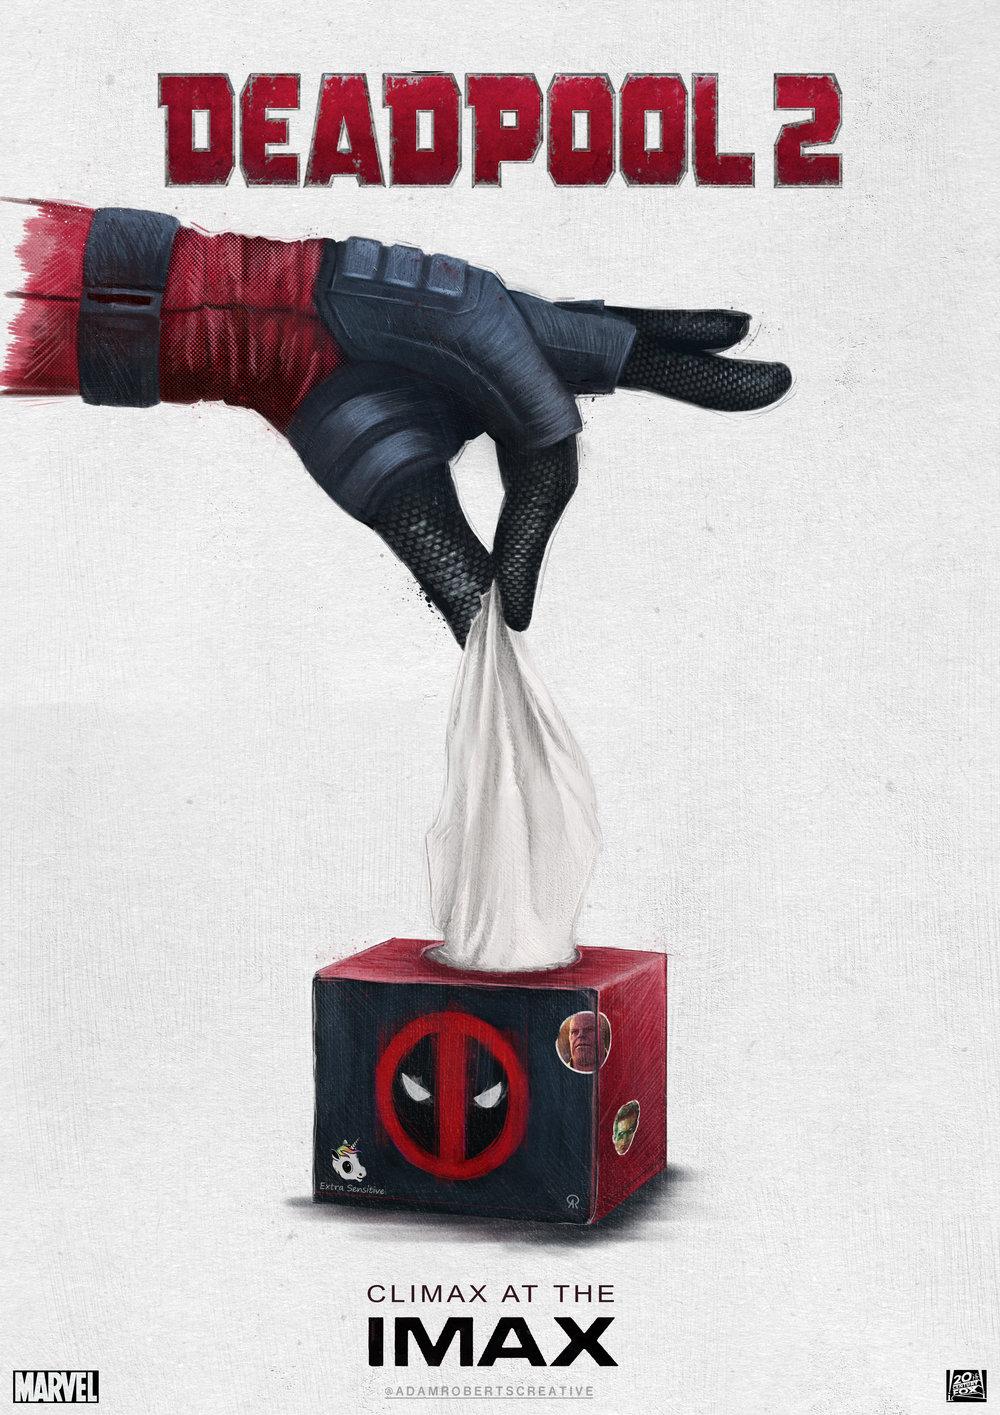 Deadpool 2 - LIMITED EDITION PRINT